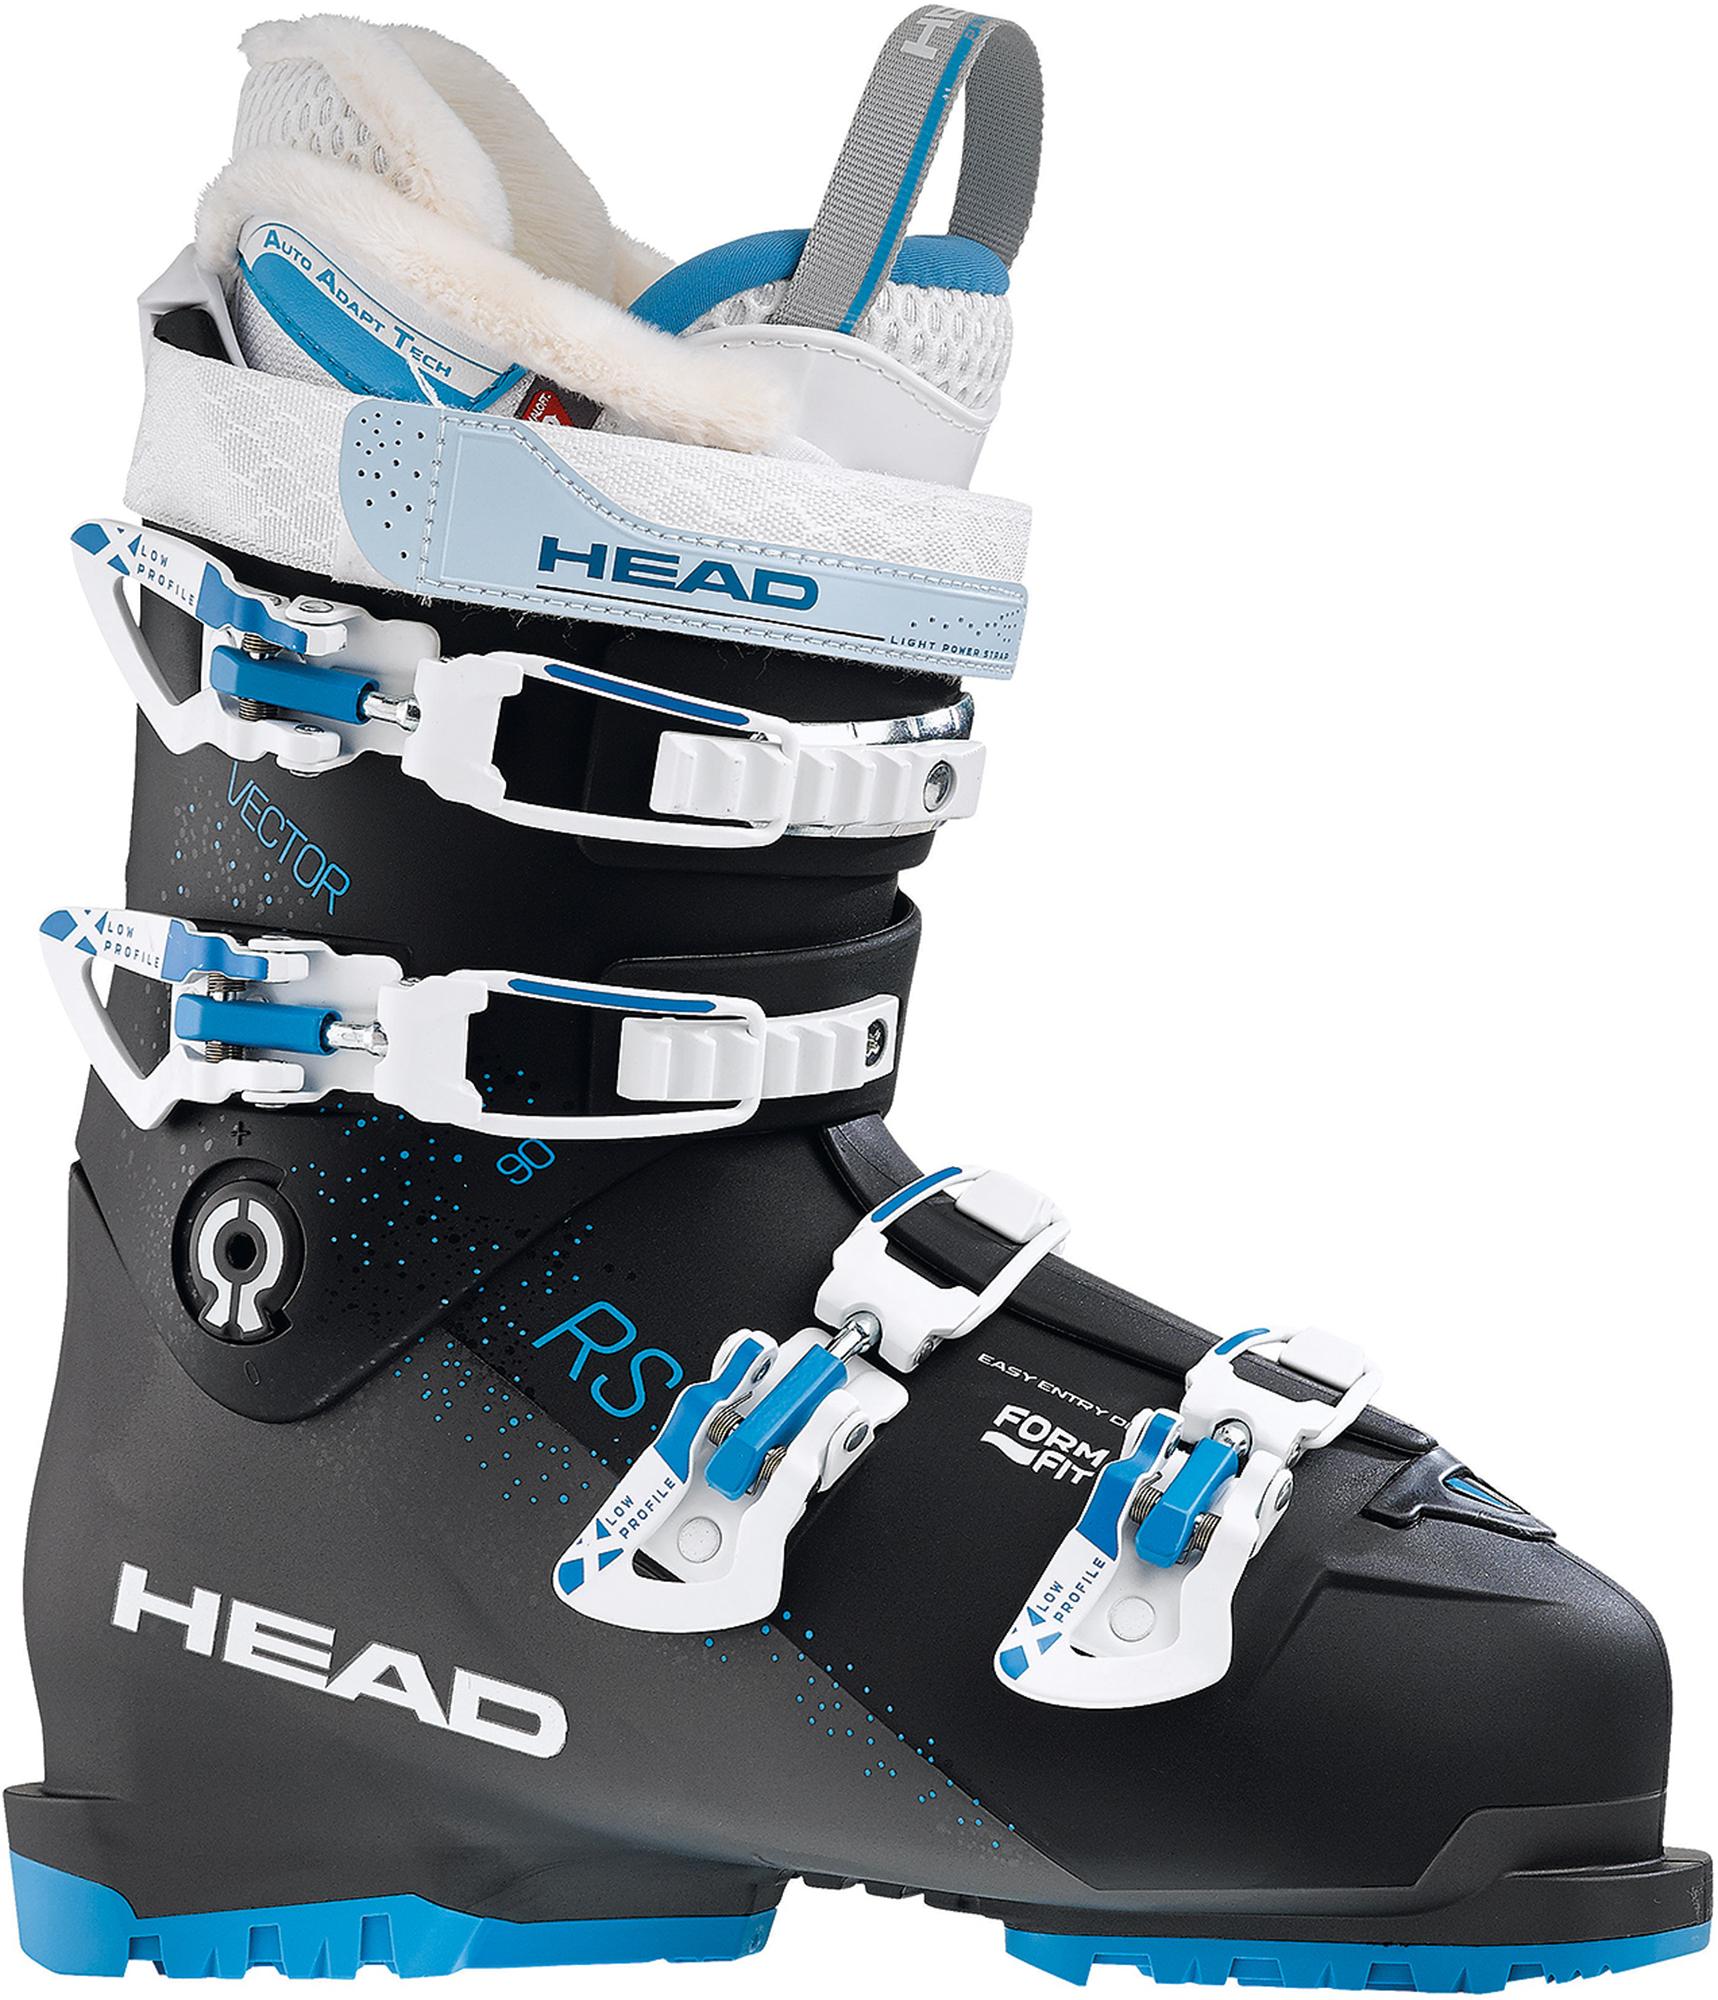 Head Ботинки горнолыжные женские Head Vector RS 90 W, размер 40